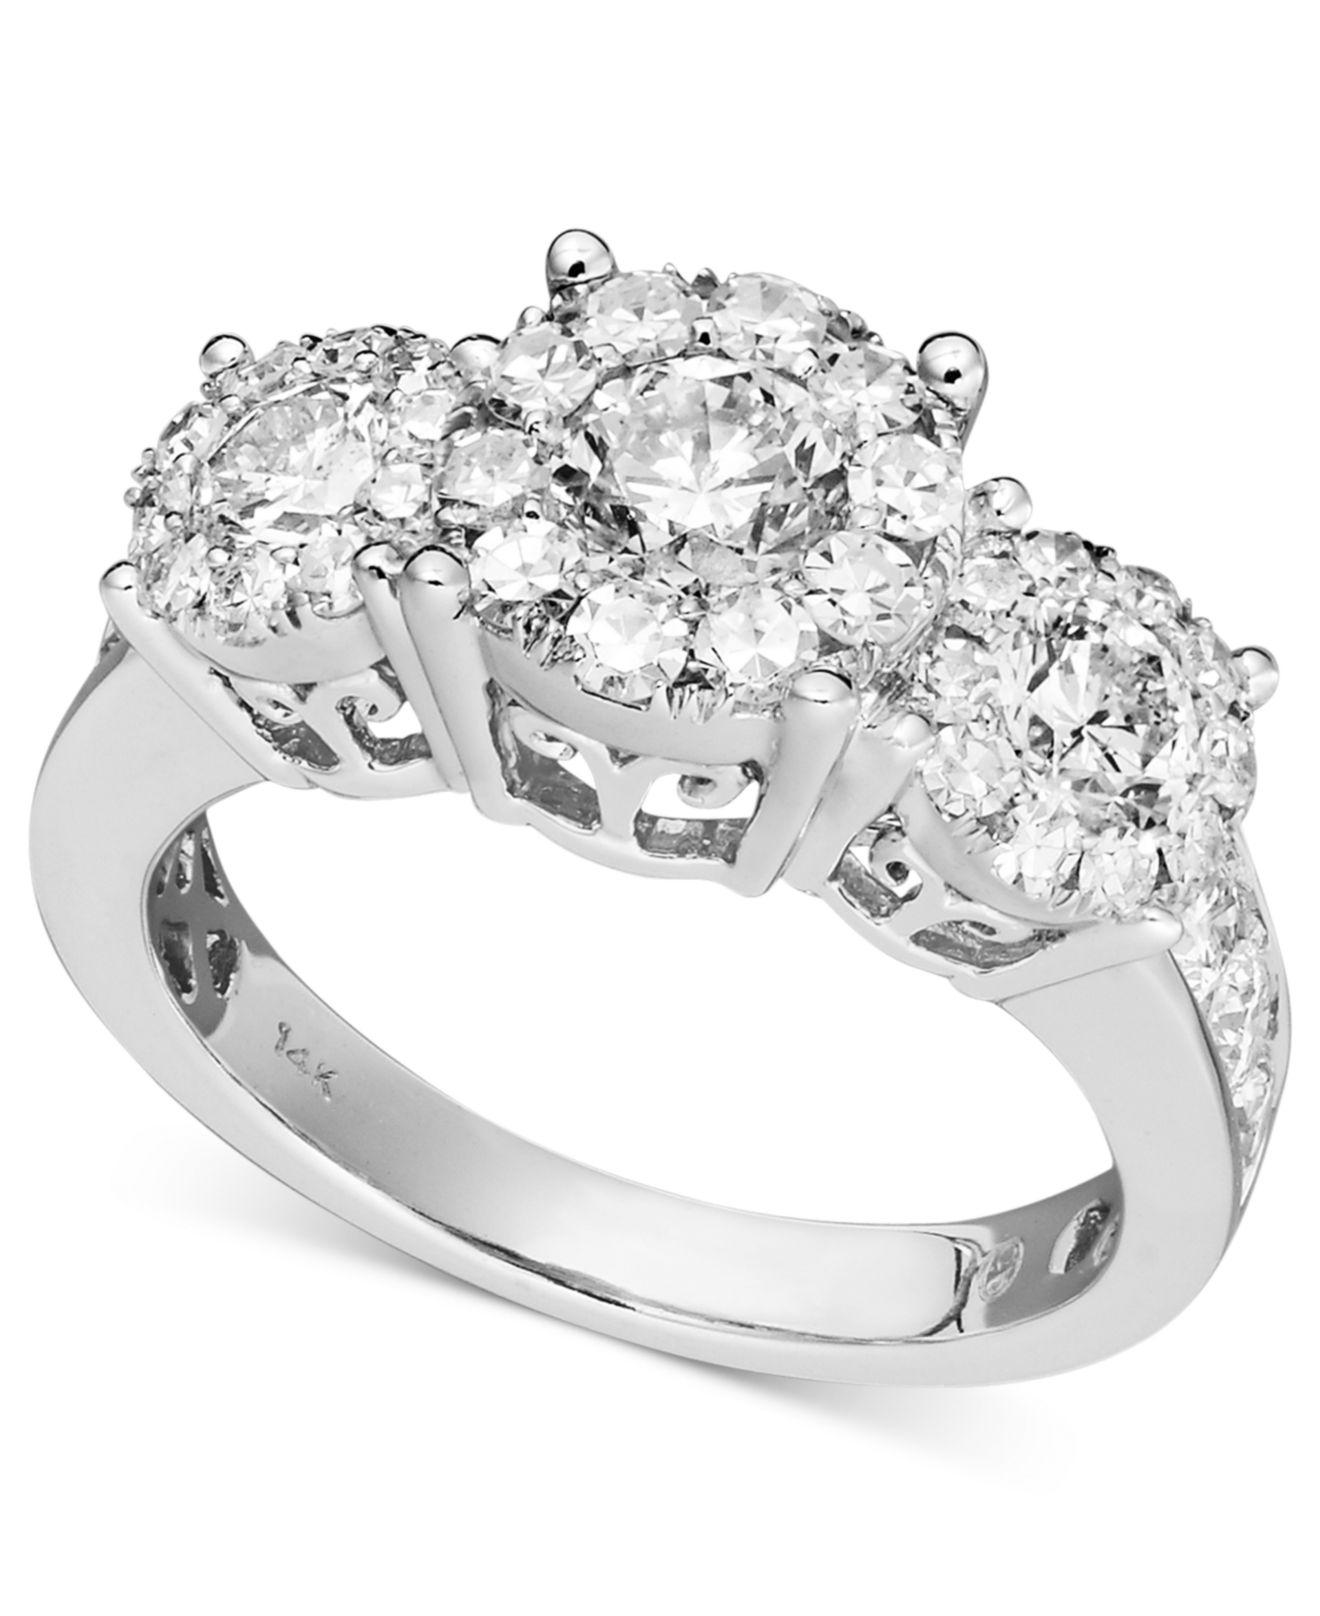 Macy's Diamond Engagement Ring In 14k White Gold (1-1/2 Ct